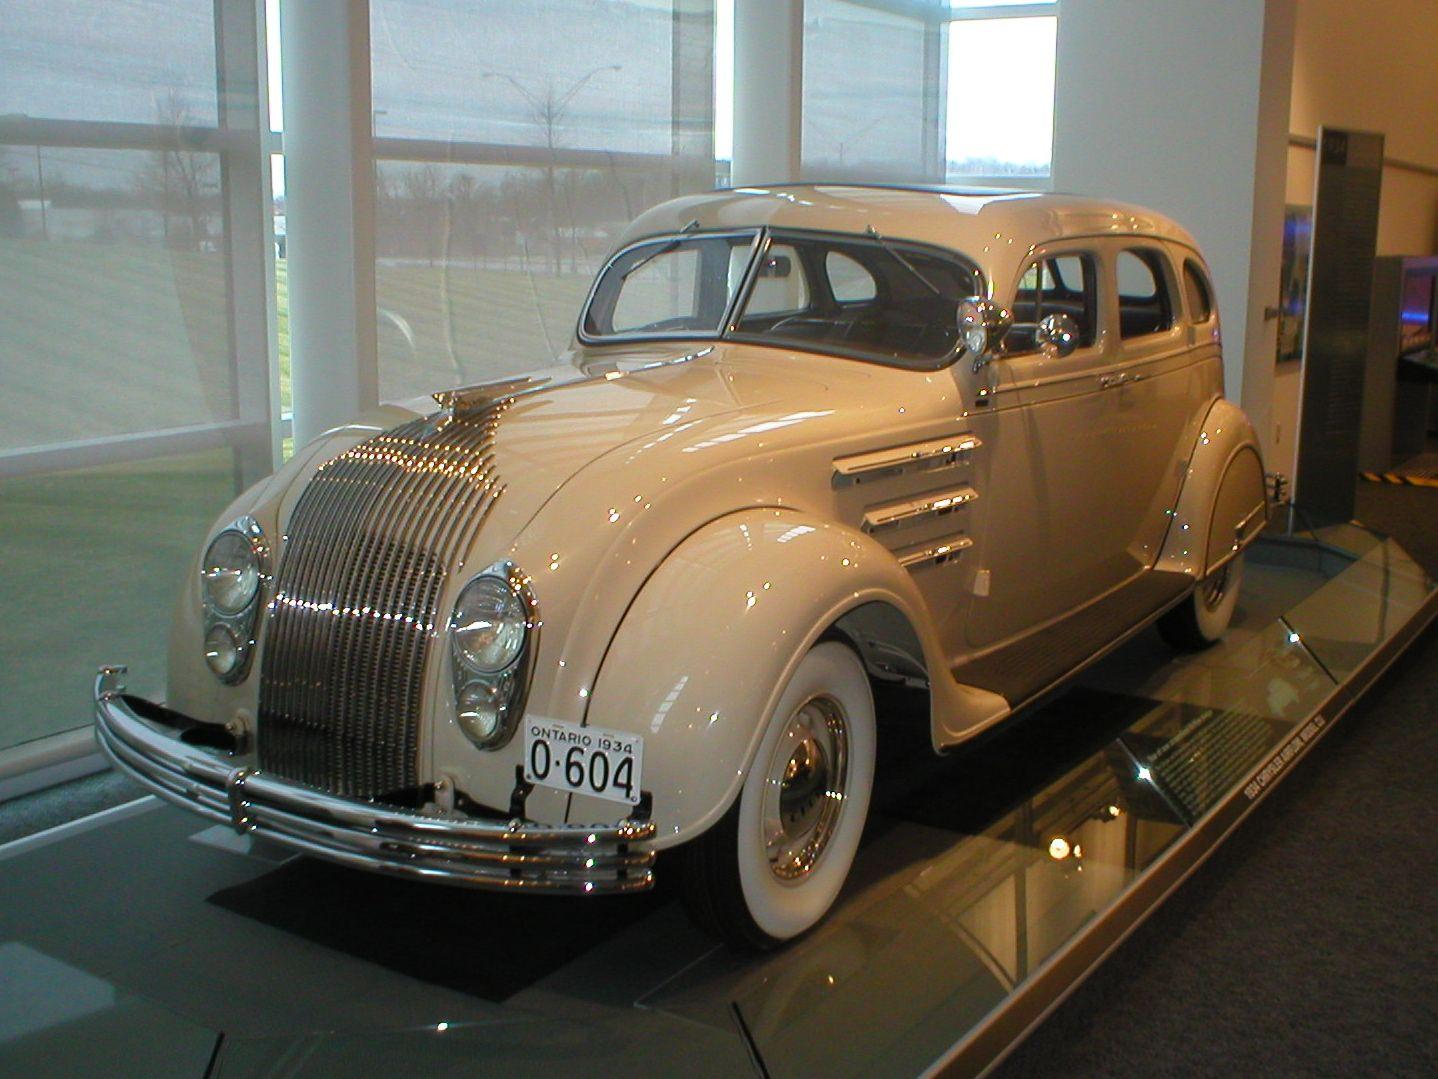 Chrysler Airflow Sedan Designed By Carl Breer 1934 With Images